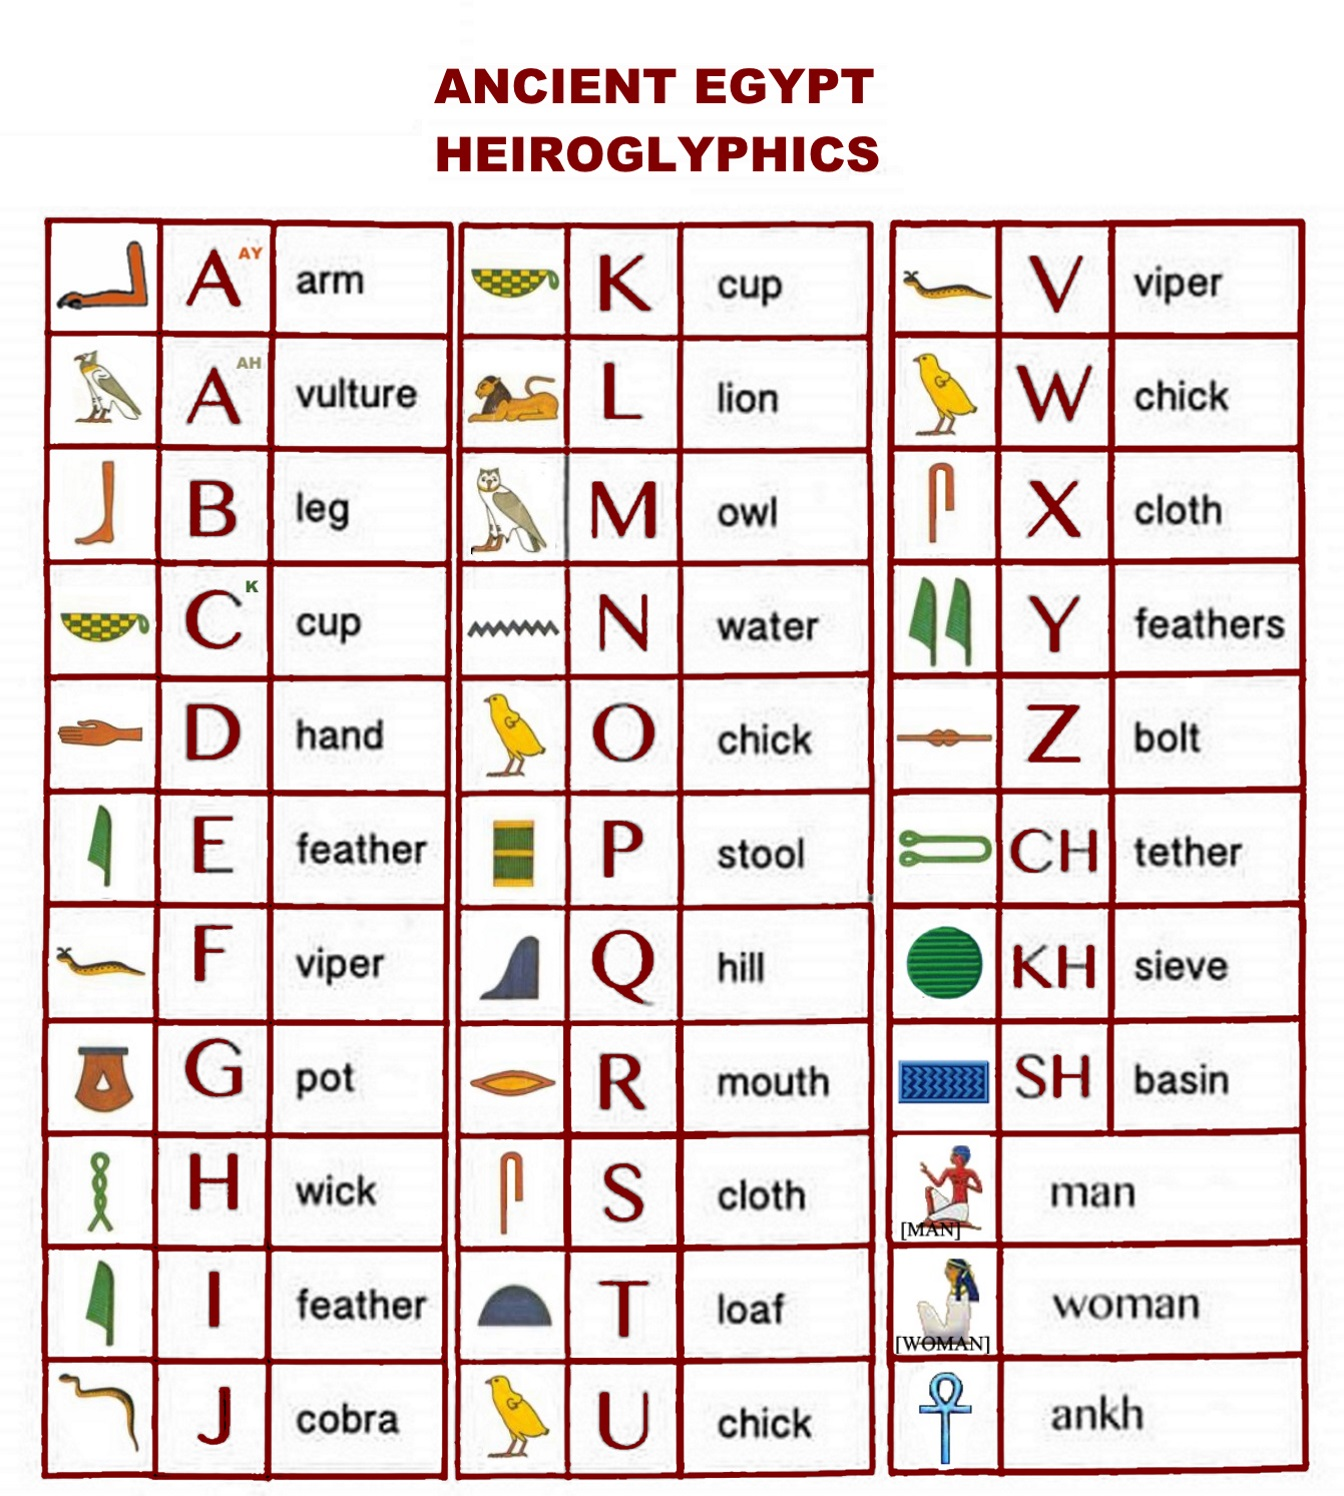 0o-hieroglyphics-chart-kAA